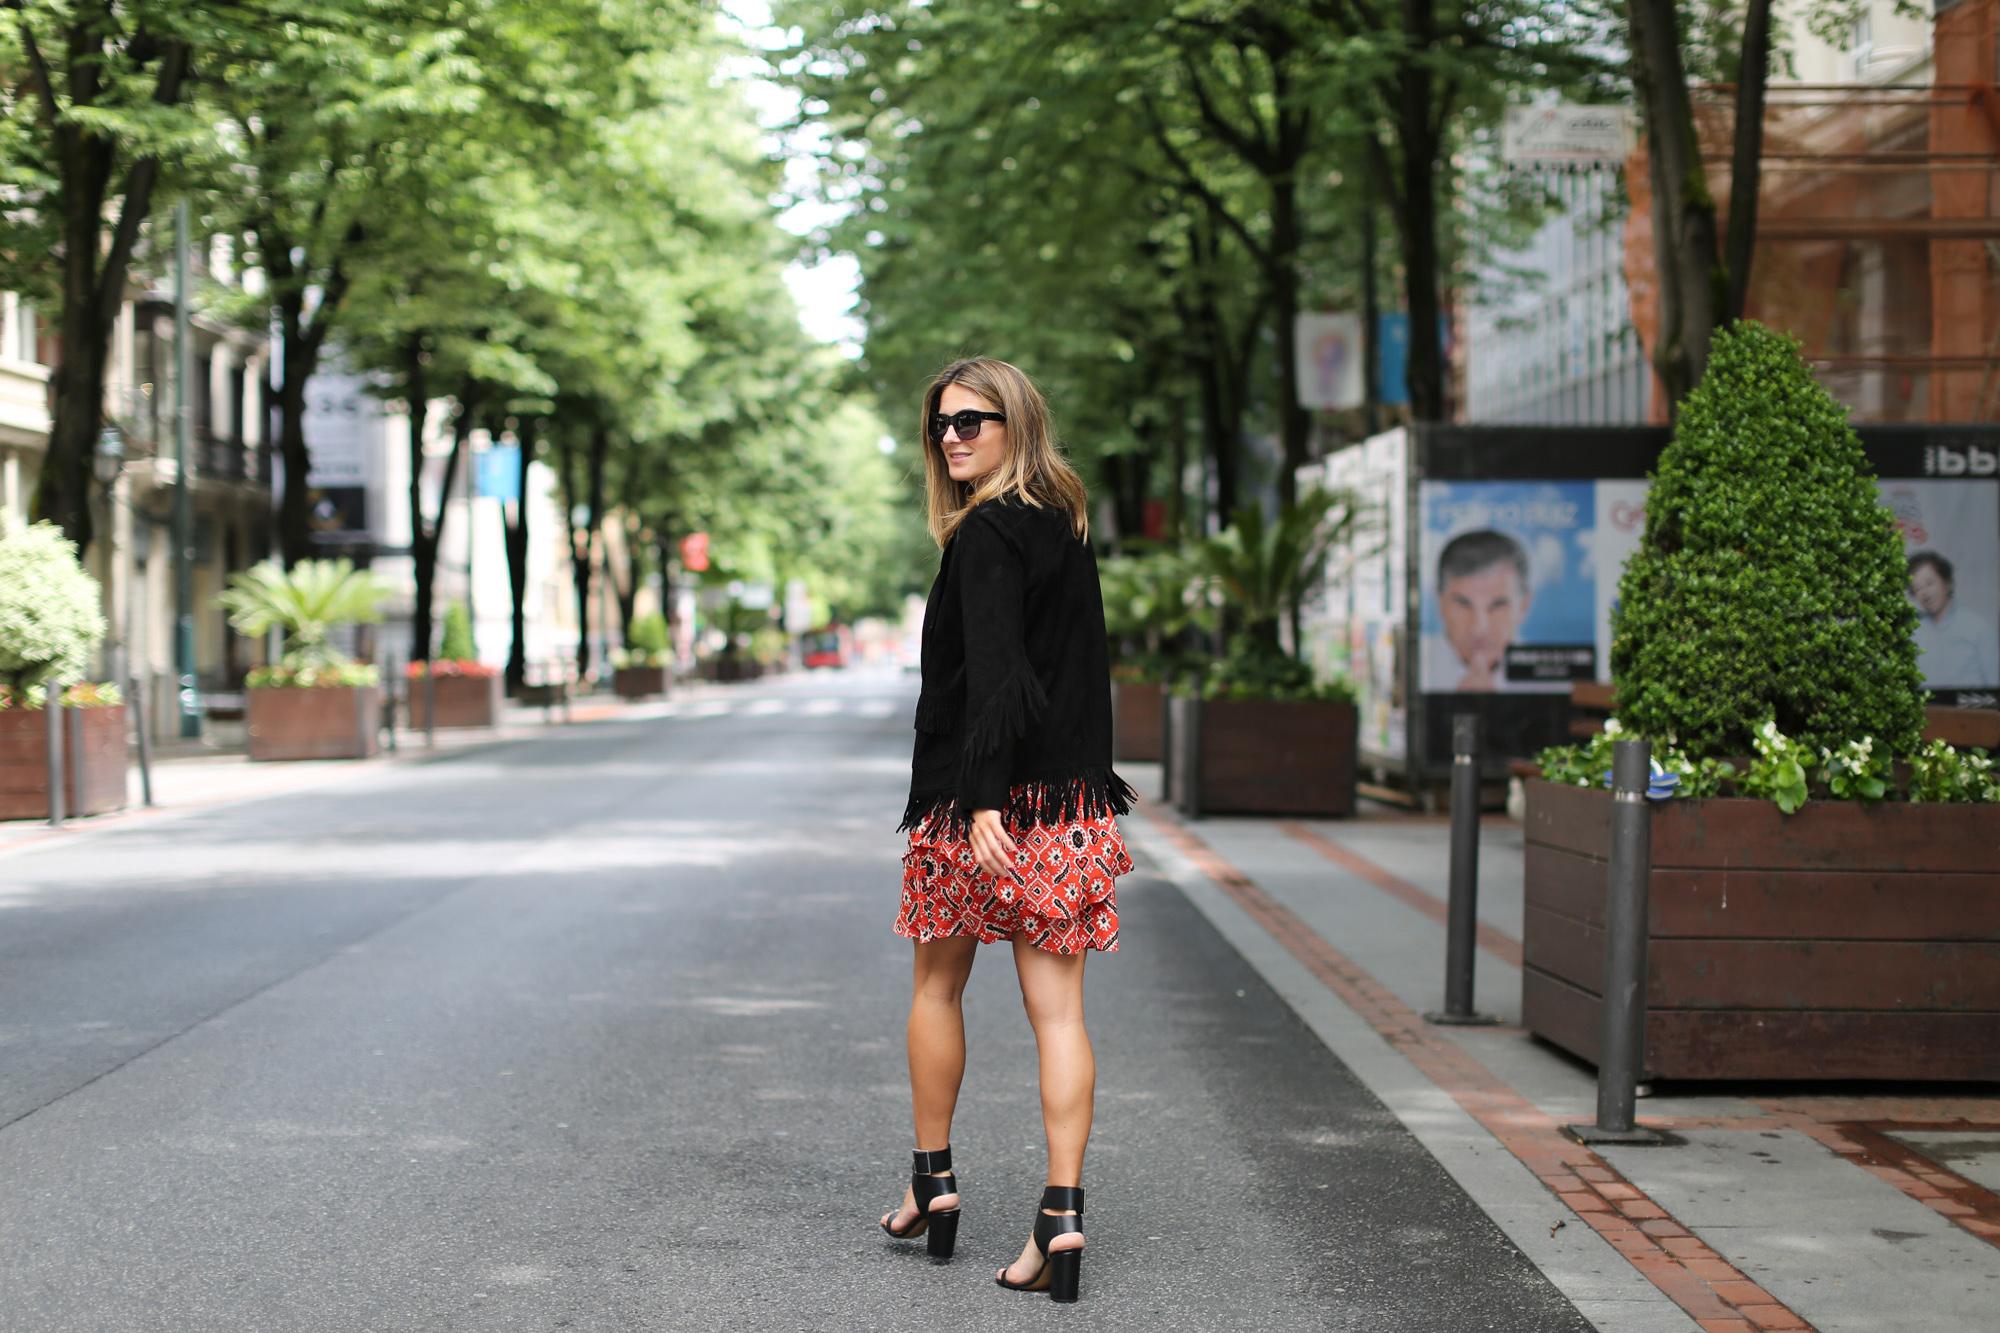 clochet_streetstyle_maje_suede-fringedjacket_hakeisilkskirt_celine_sunglasses